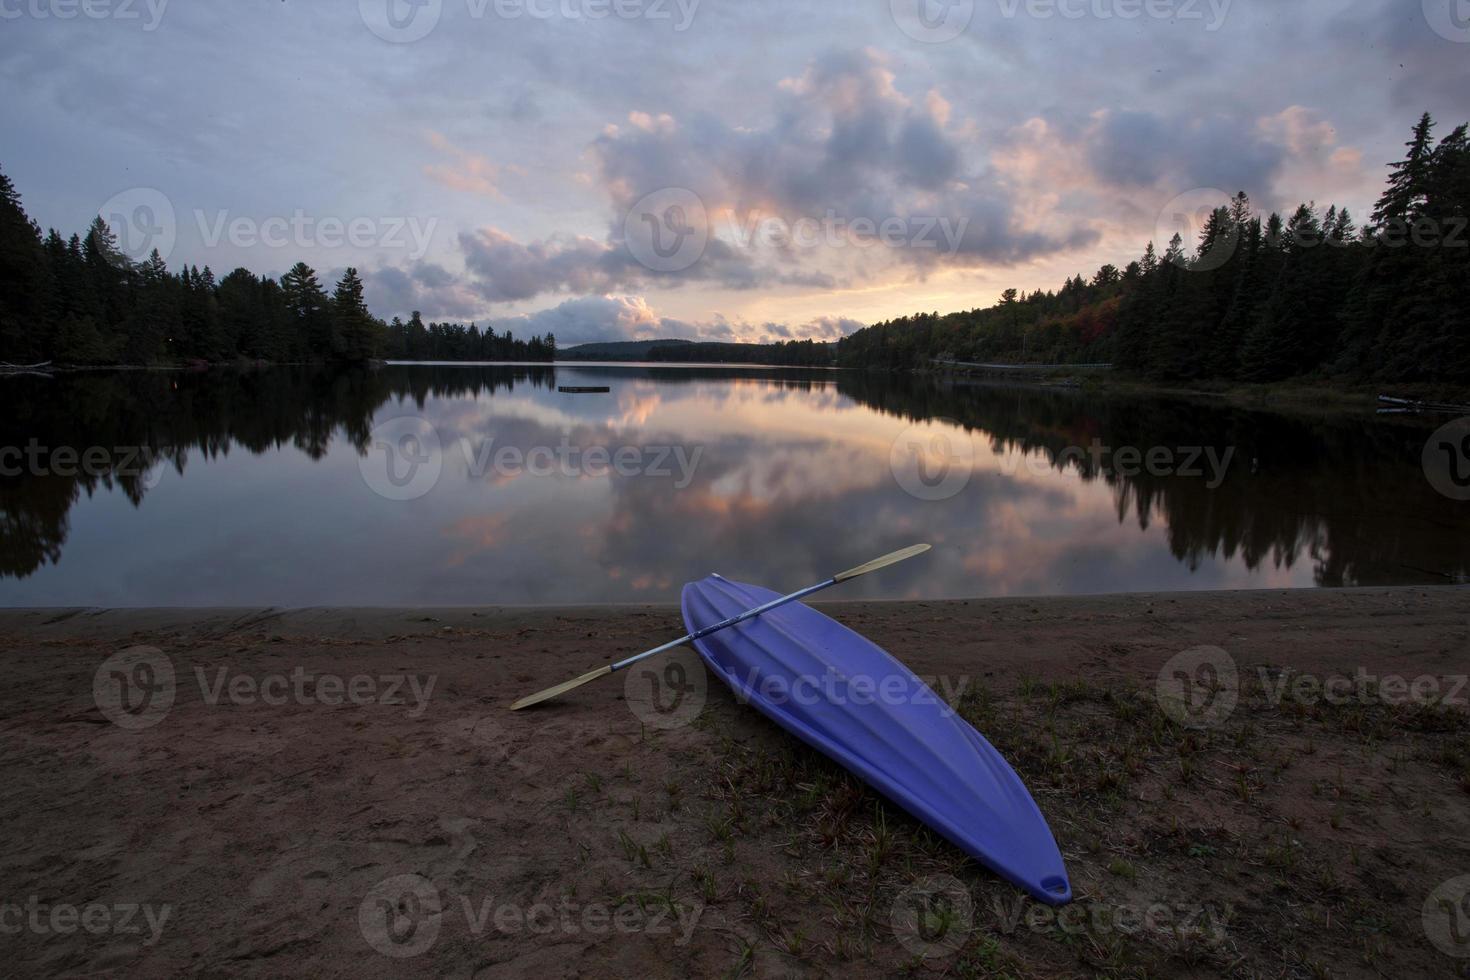 algonquin park muskoka ontario meer wildernis foto